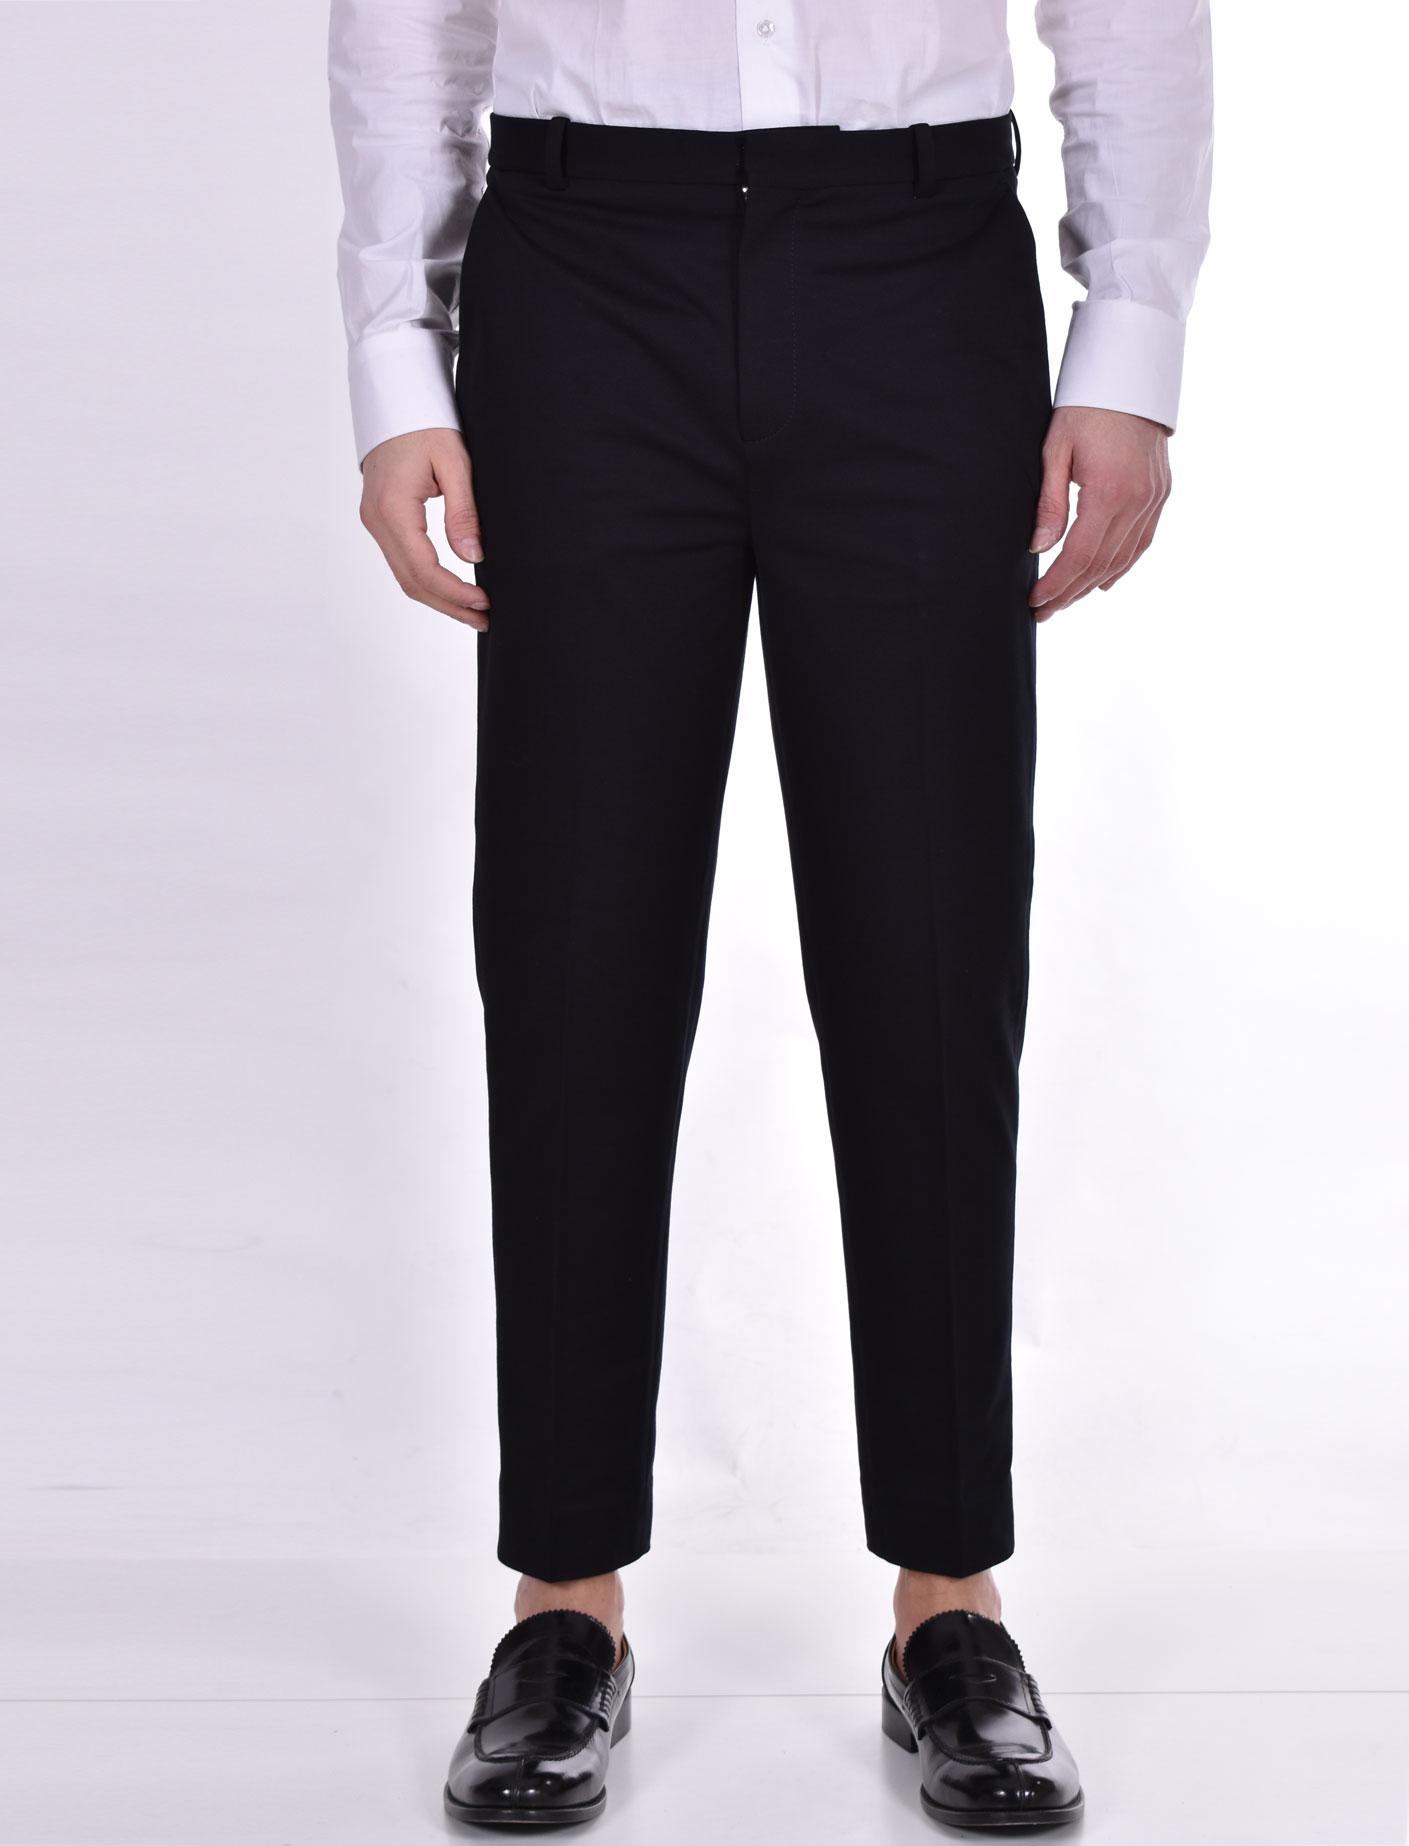 Circolo 1901 black sweatshirt trousers CIRCOLO 1901 | CN2957001